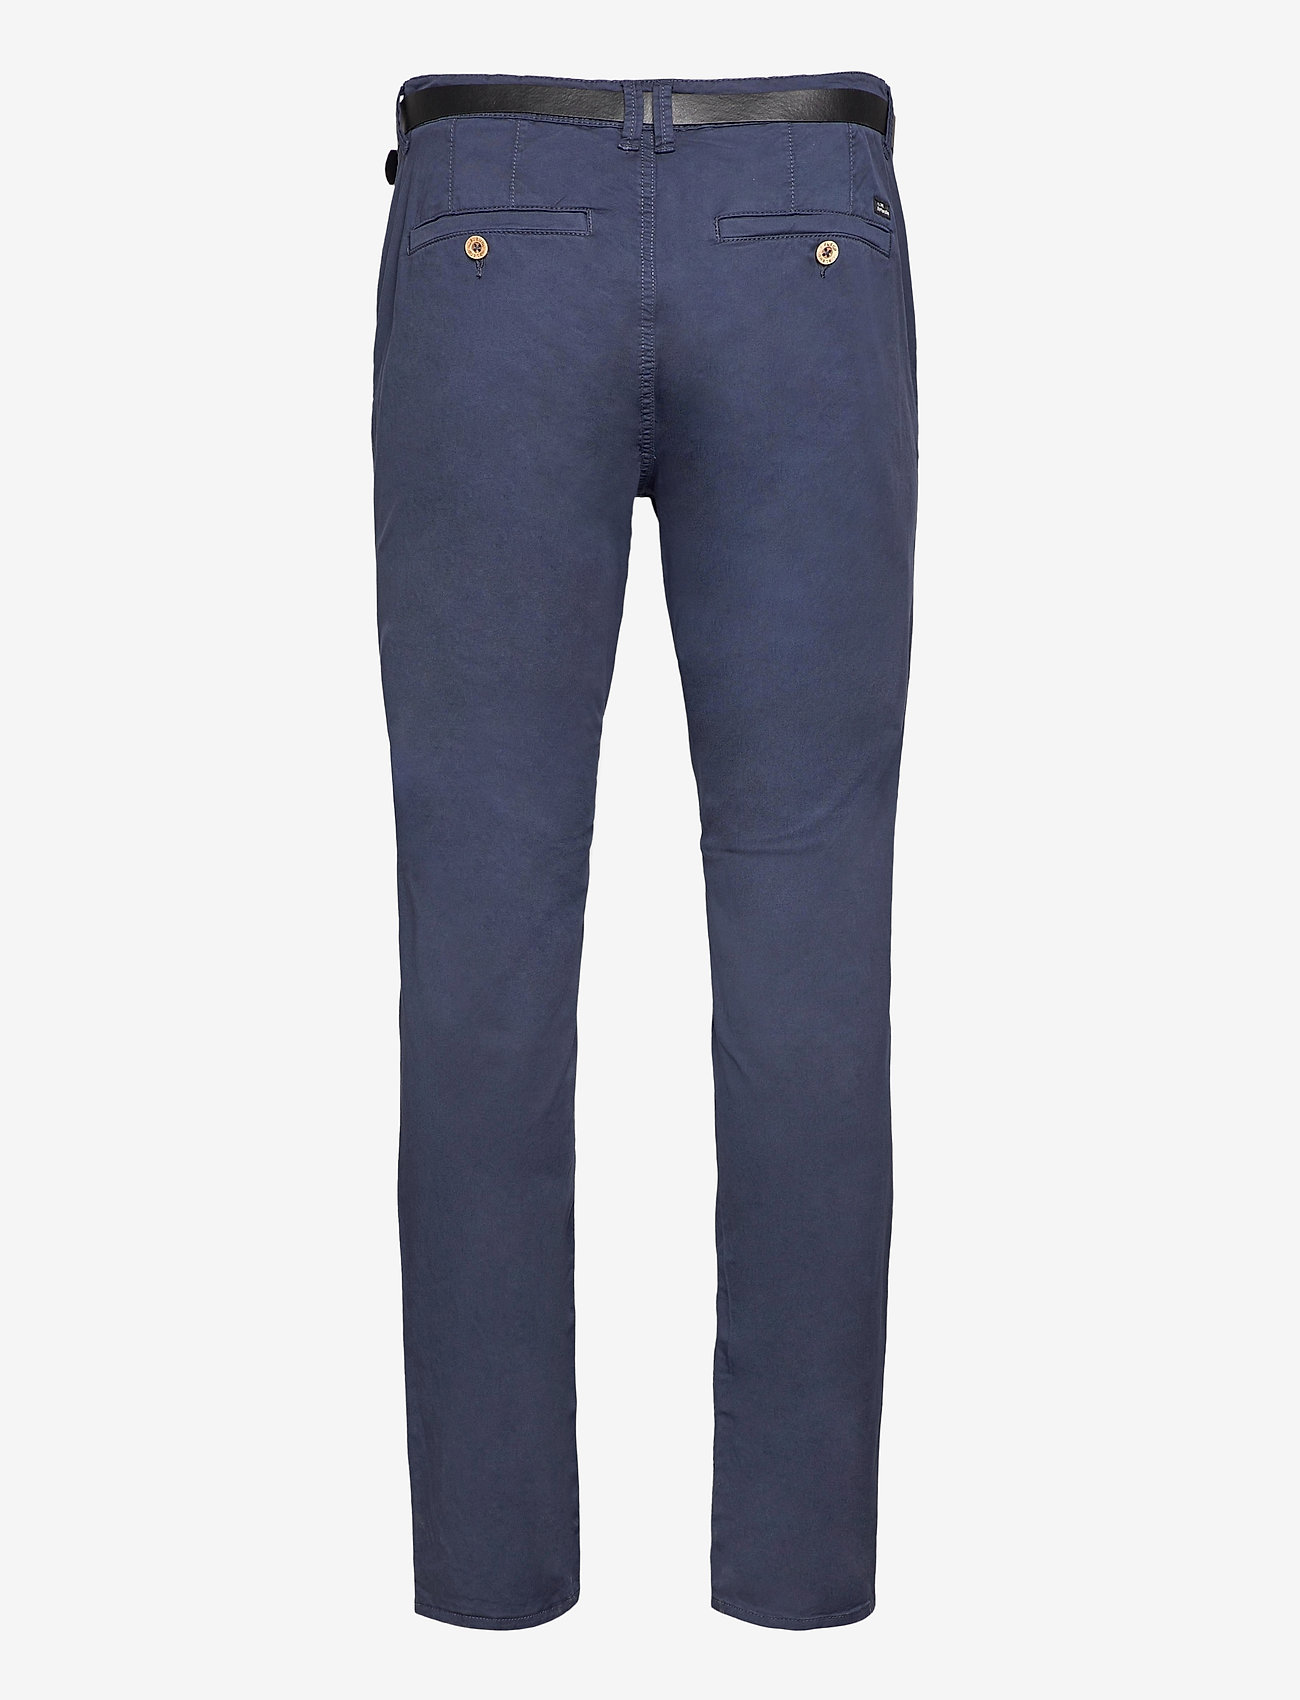 Blend - Pants - chino's - dress blues - 1